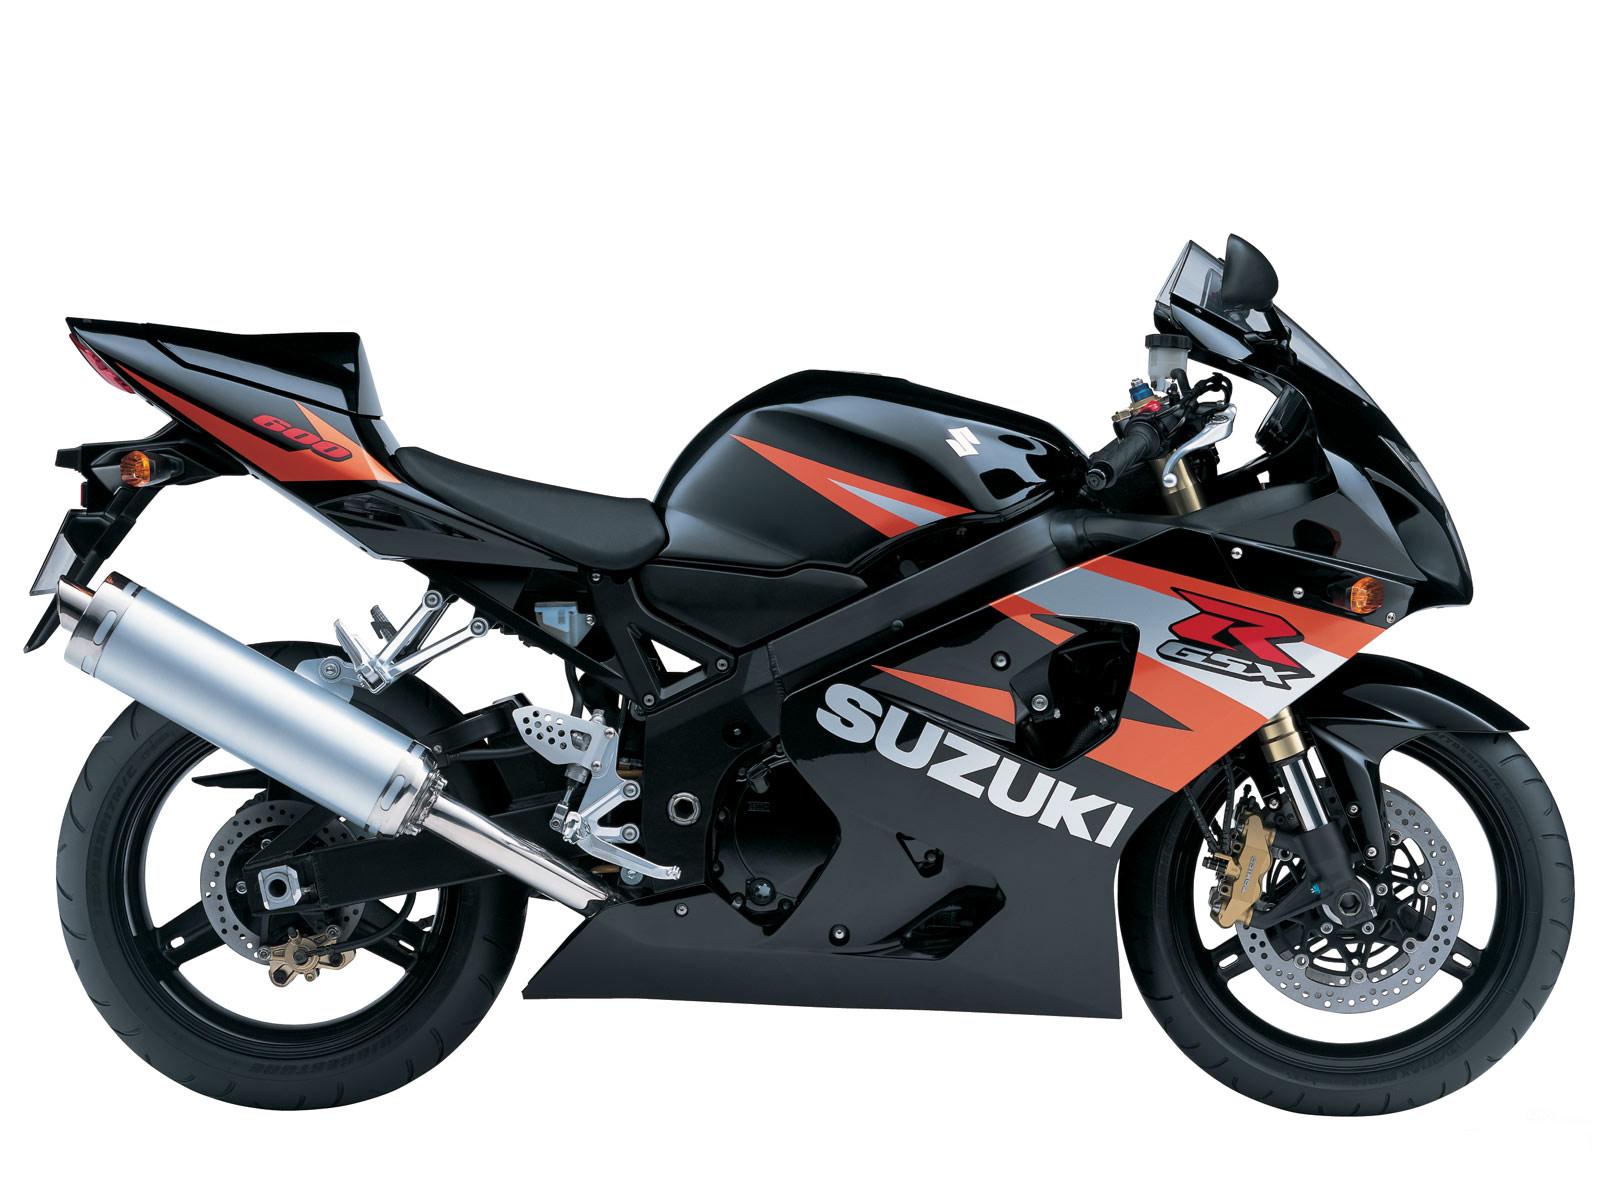 http://4.bp.blogspot.com/_ja0nvj5Jato/TIJ9qKfTWfI/AAAAAAAAIE4/15iCTl5CvvE/s1600/suzuki_GSX-R_600_2004_motorcycle_pictures-5.jpg